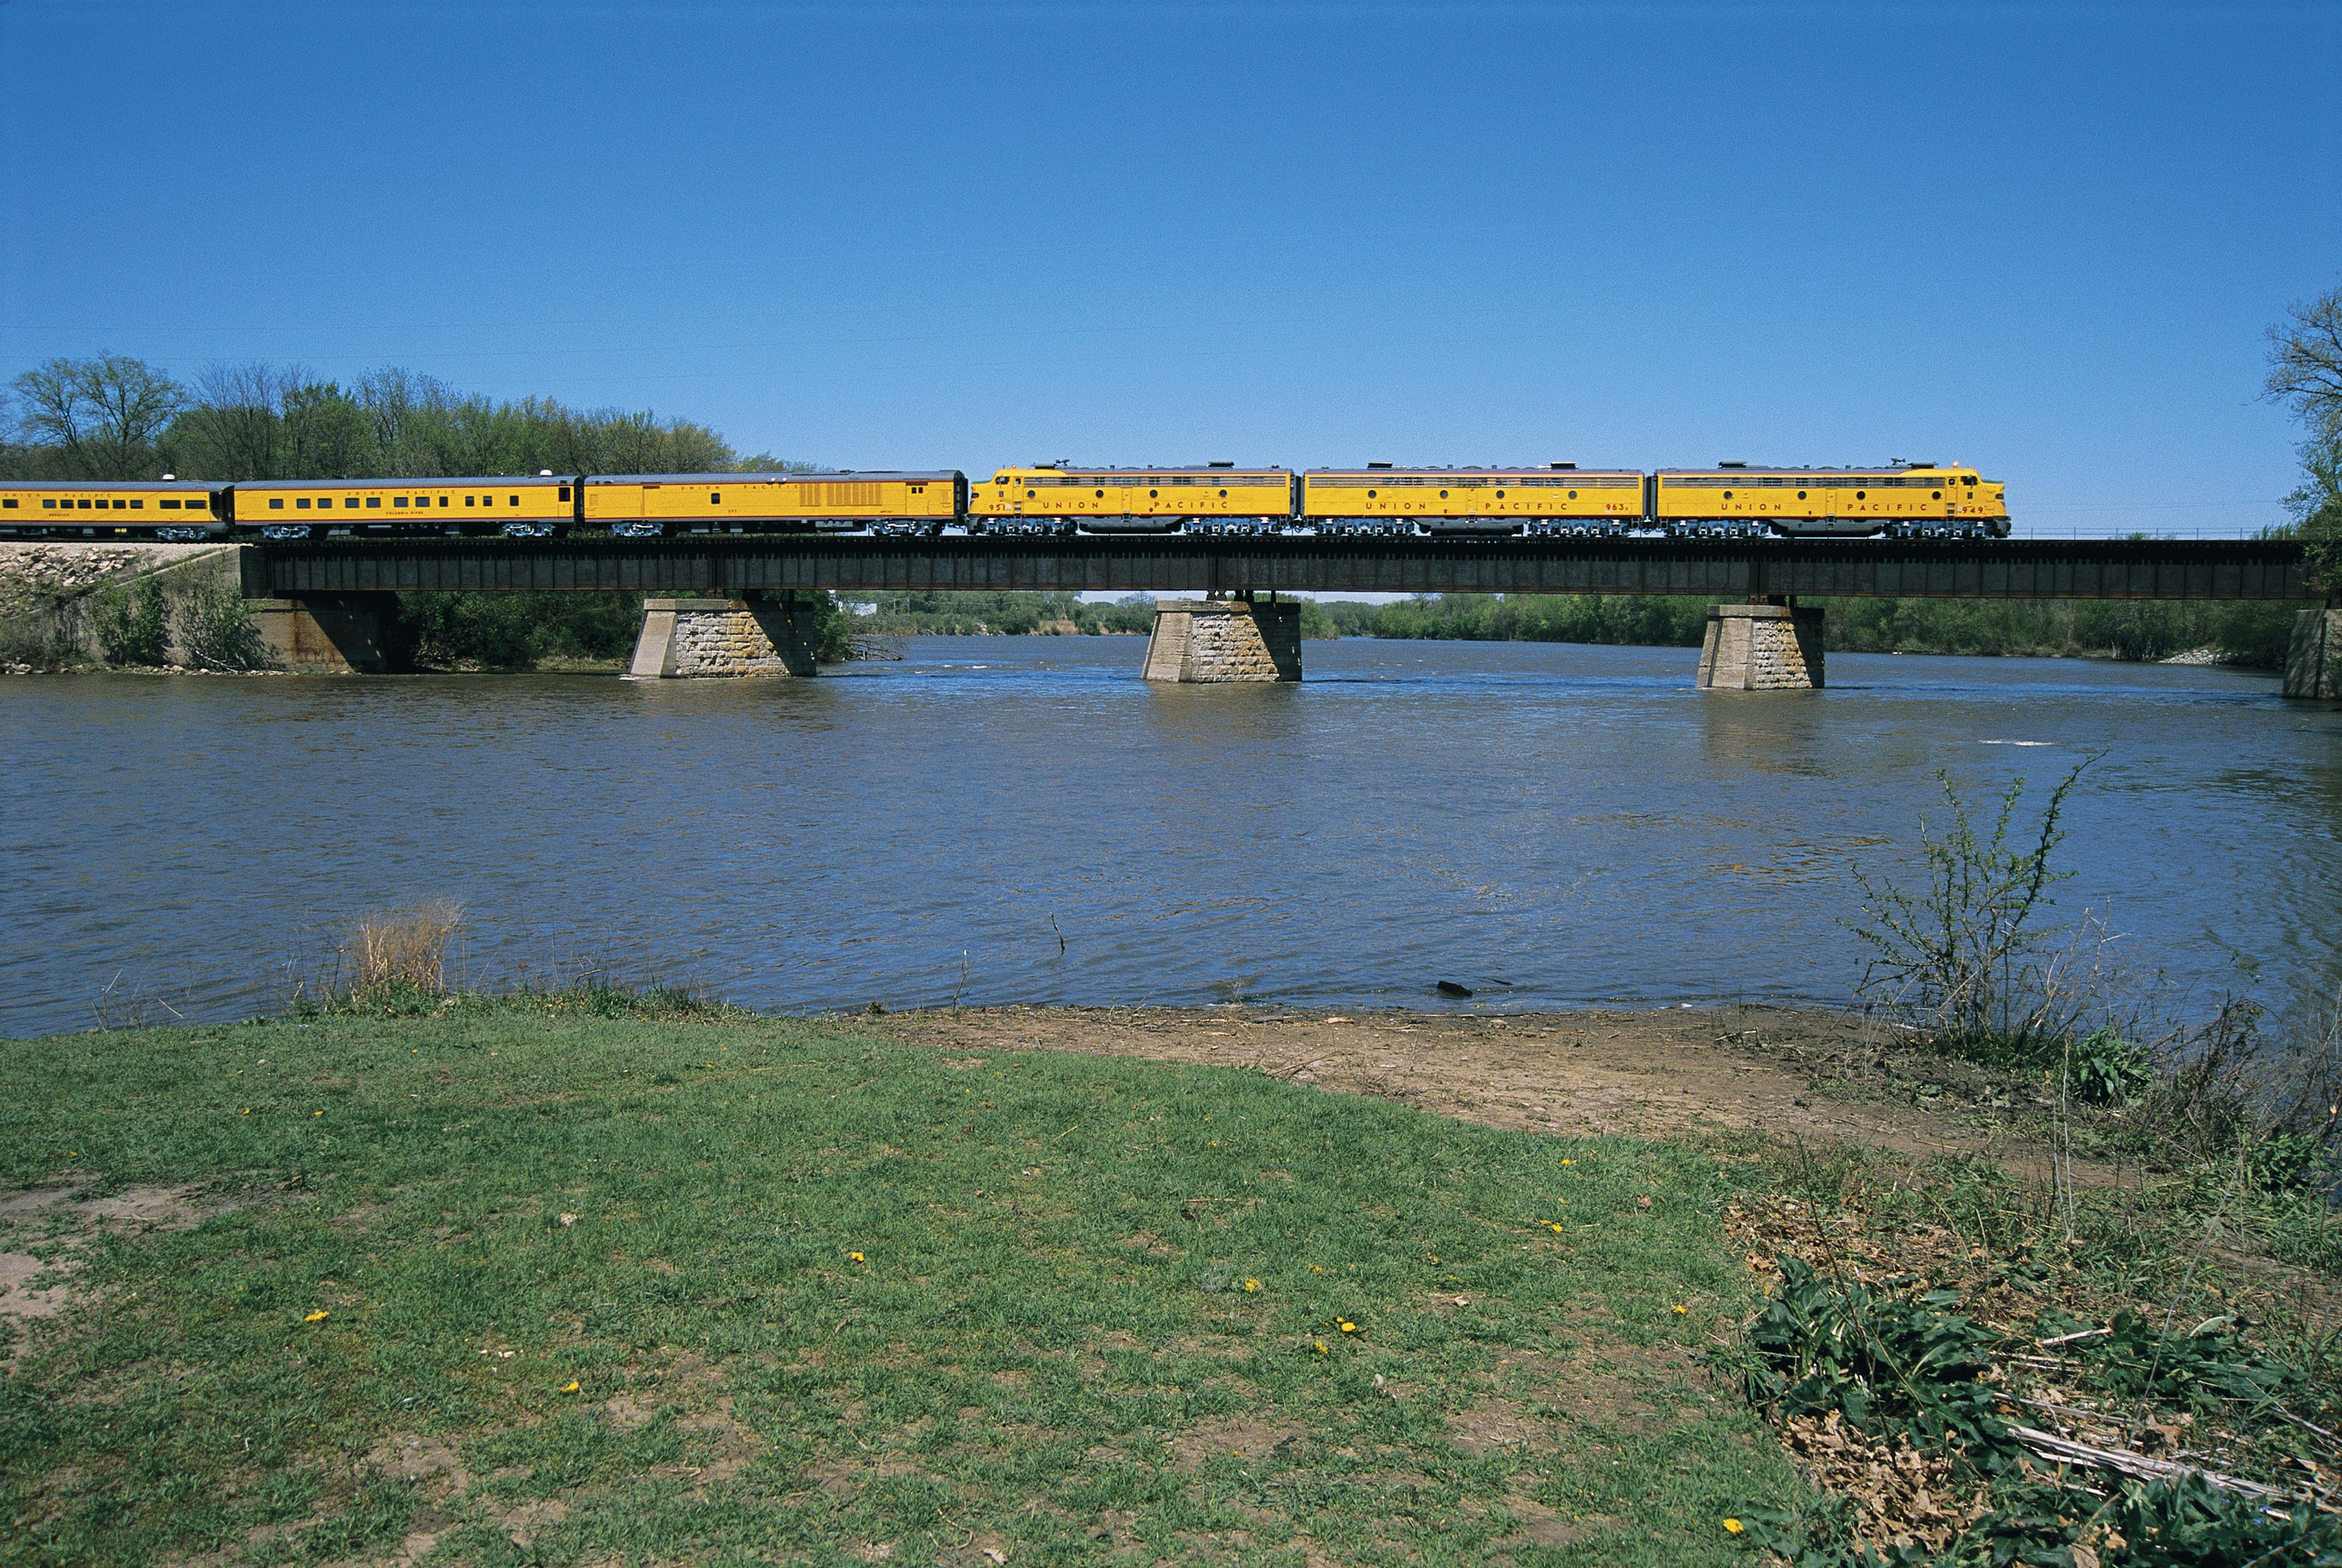 A Union Pacific train crossing a bridge over a body of water.